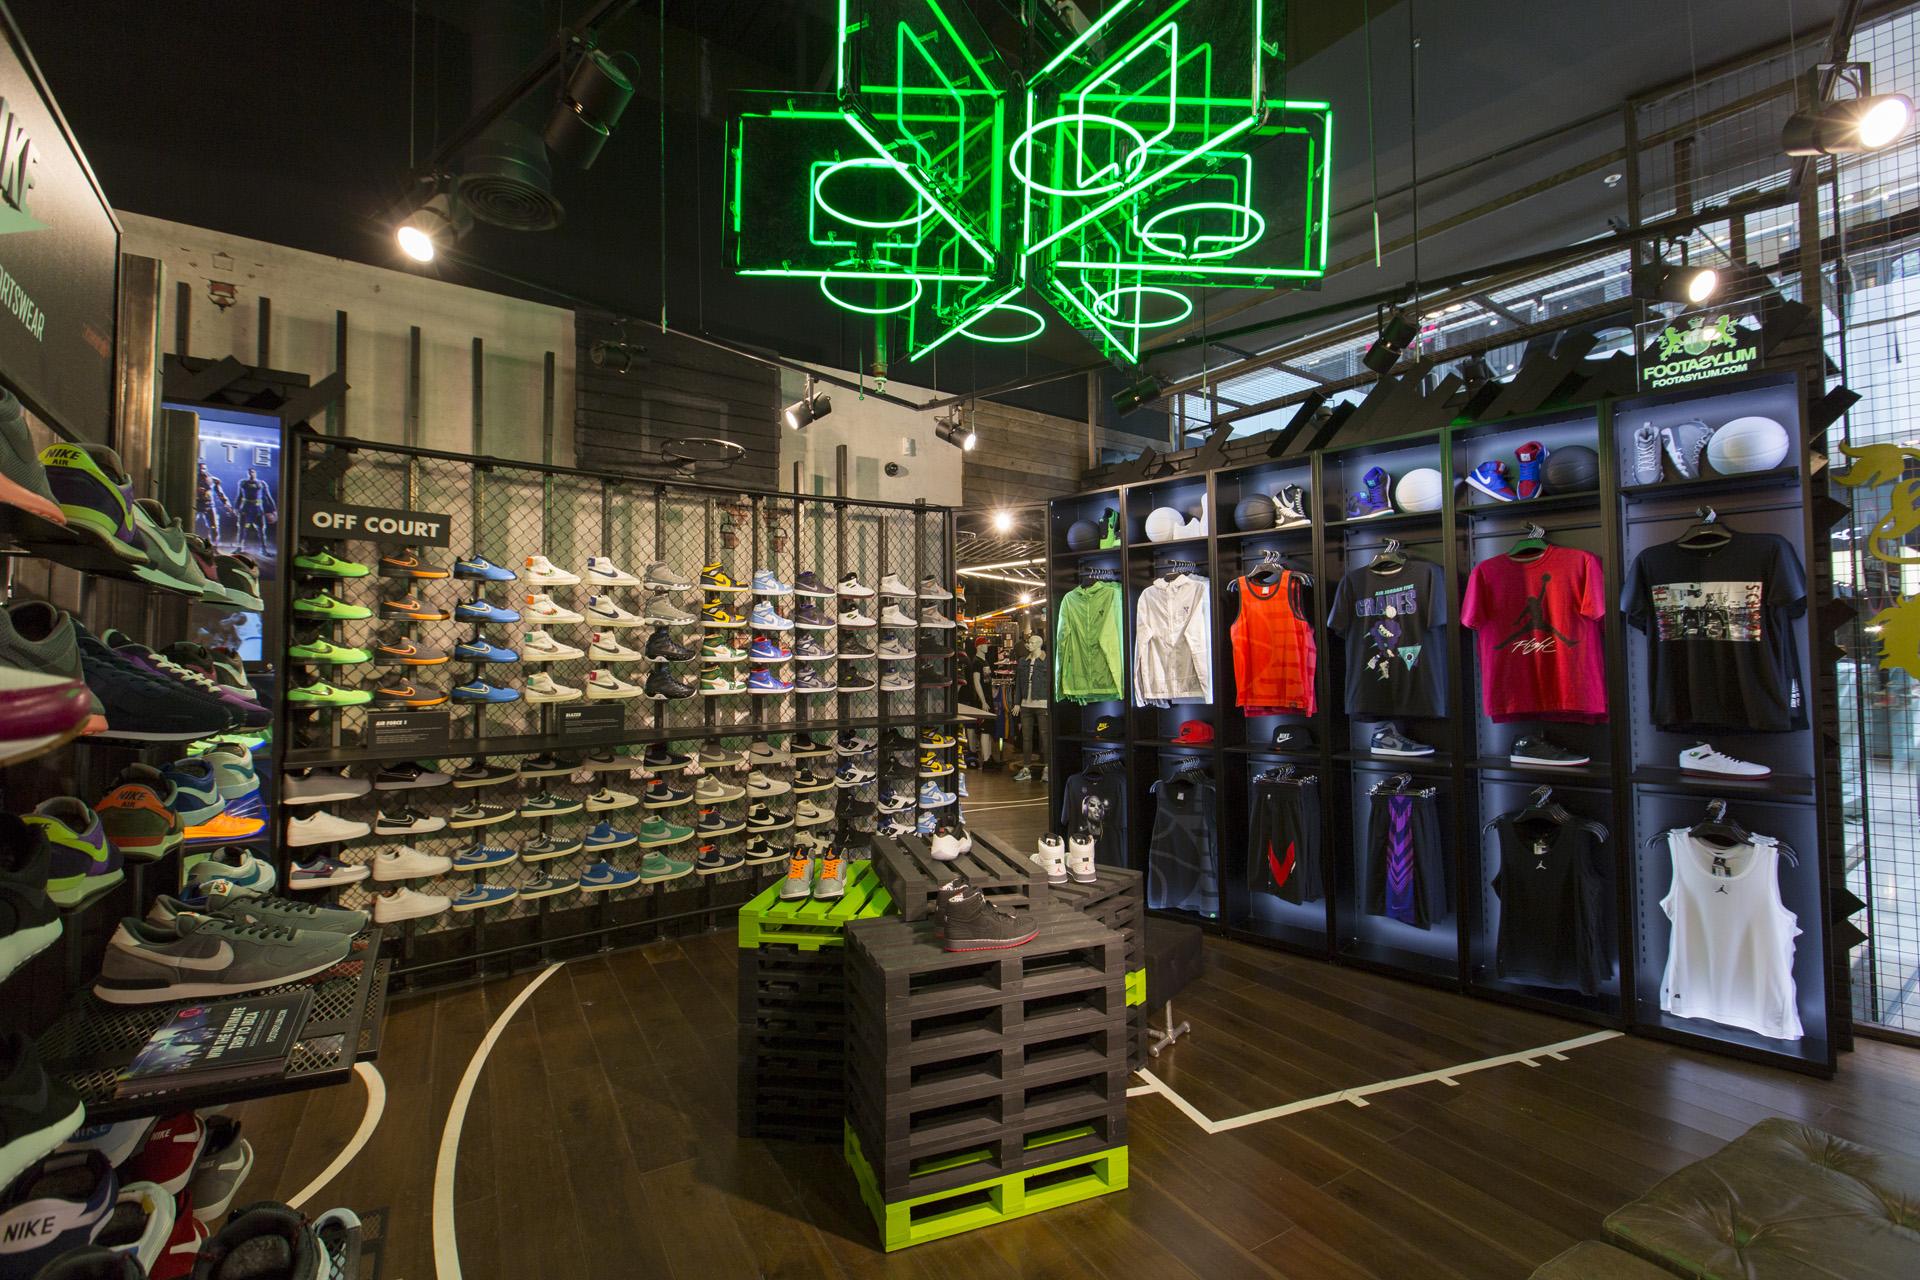 Nike Retail Display in Footasylum stores